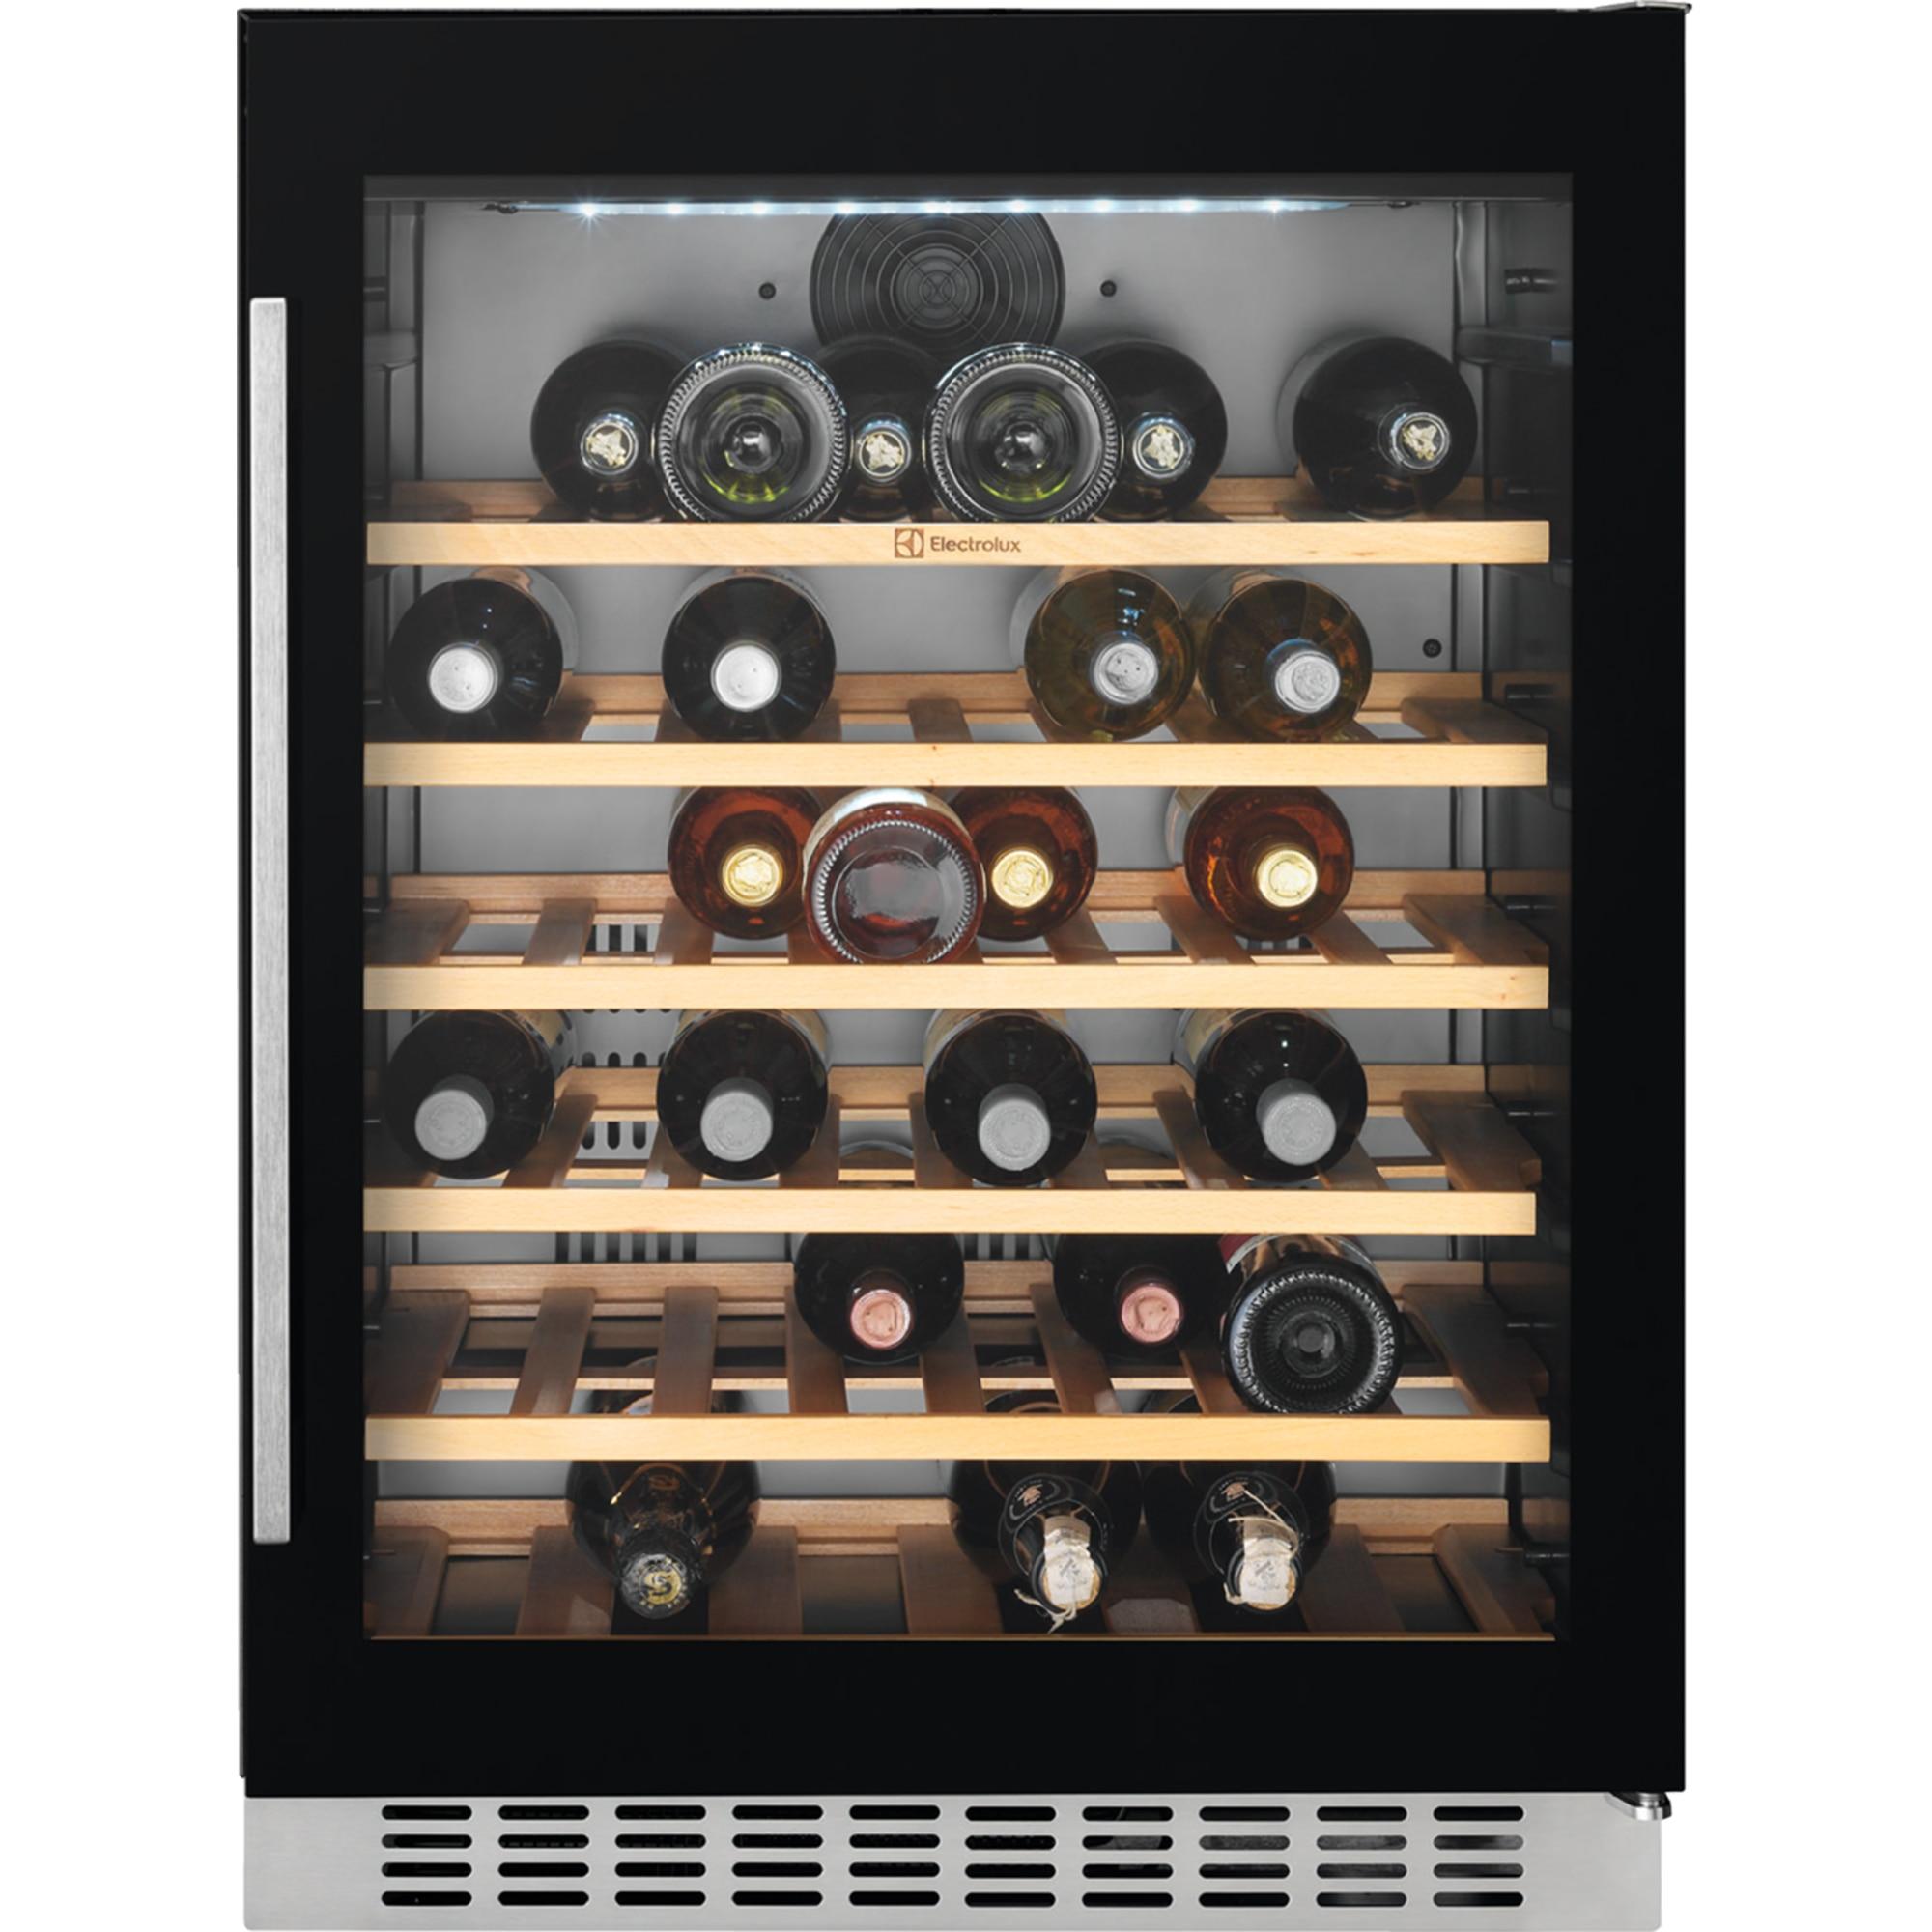 Fotografie Vitrina de vinuri incorporabila Electrolux ERW1573AOA, 138 l, Capacitate 46 sticle, Clasa A, H 82 cm